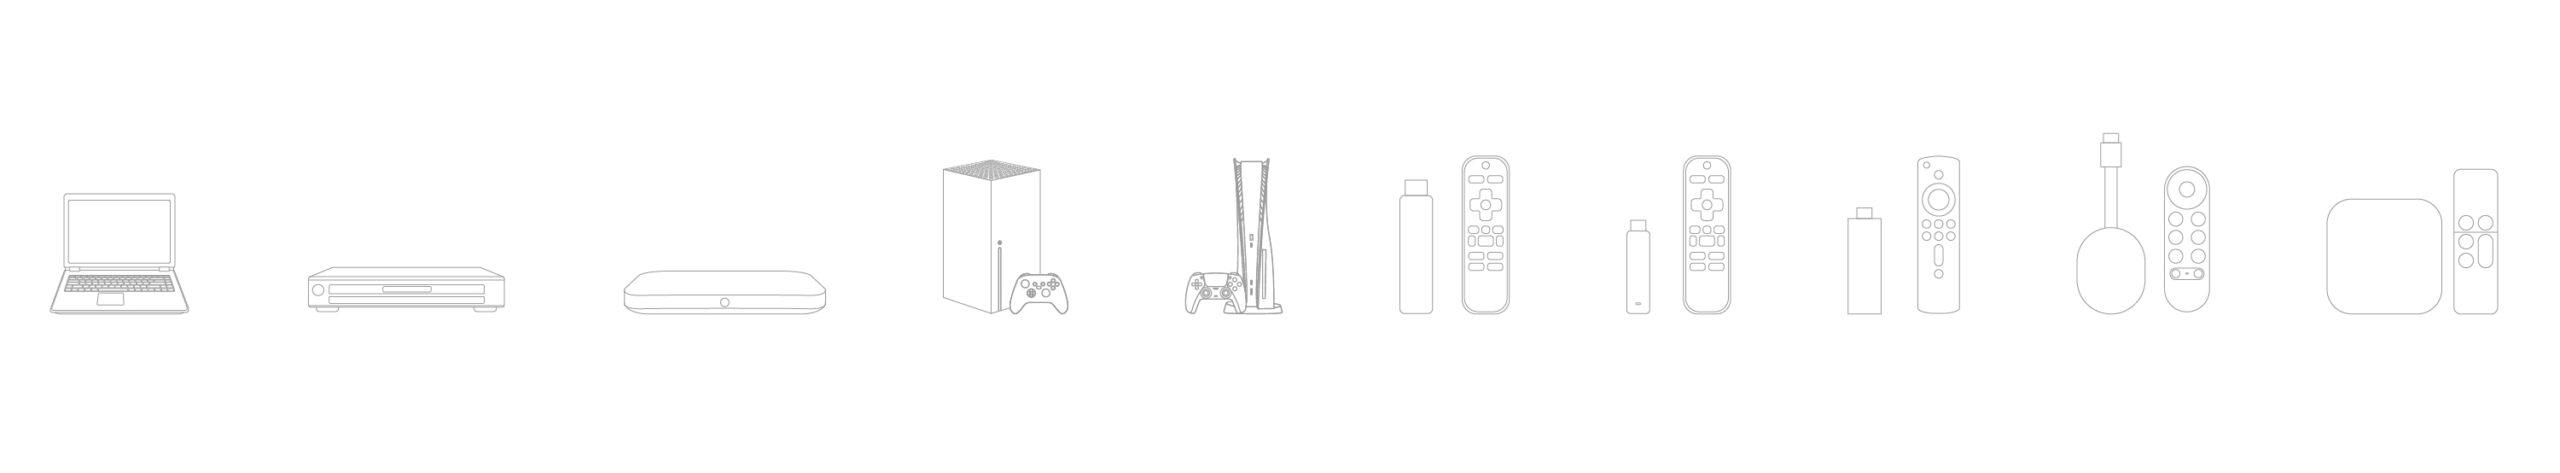 HDMI Sources